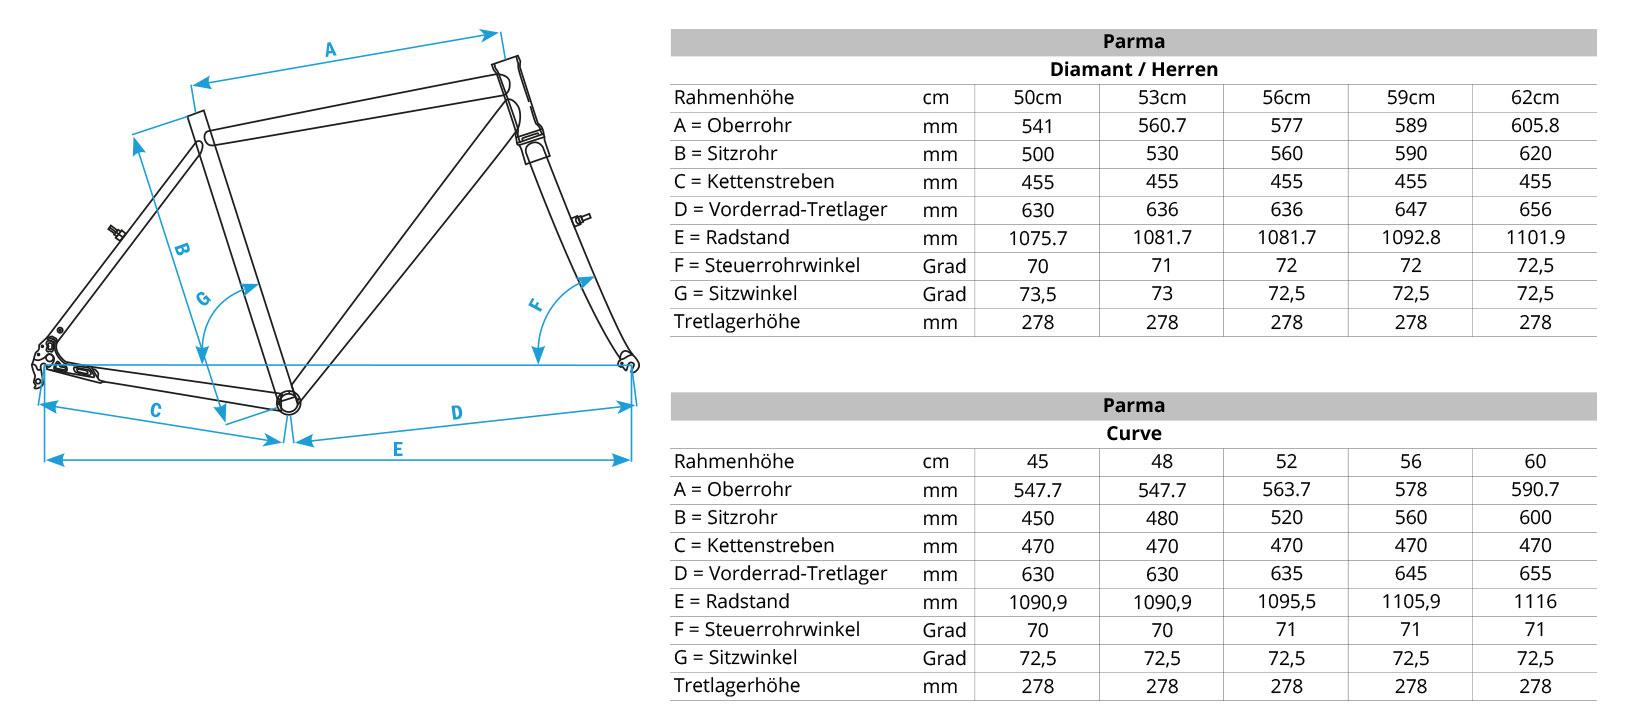 Geometriedaten Parma